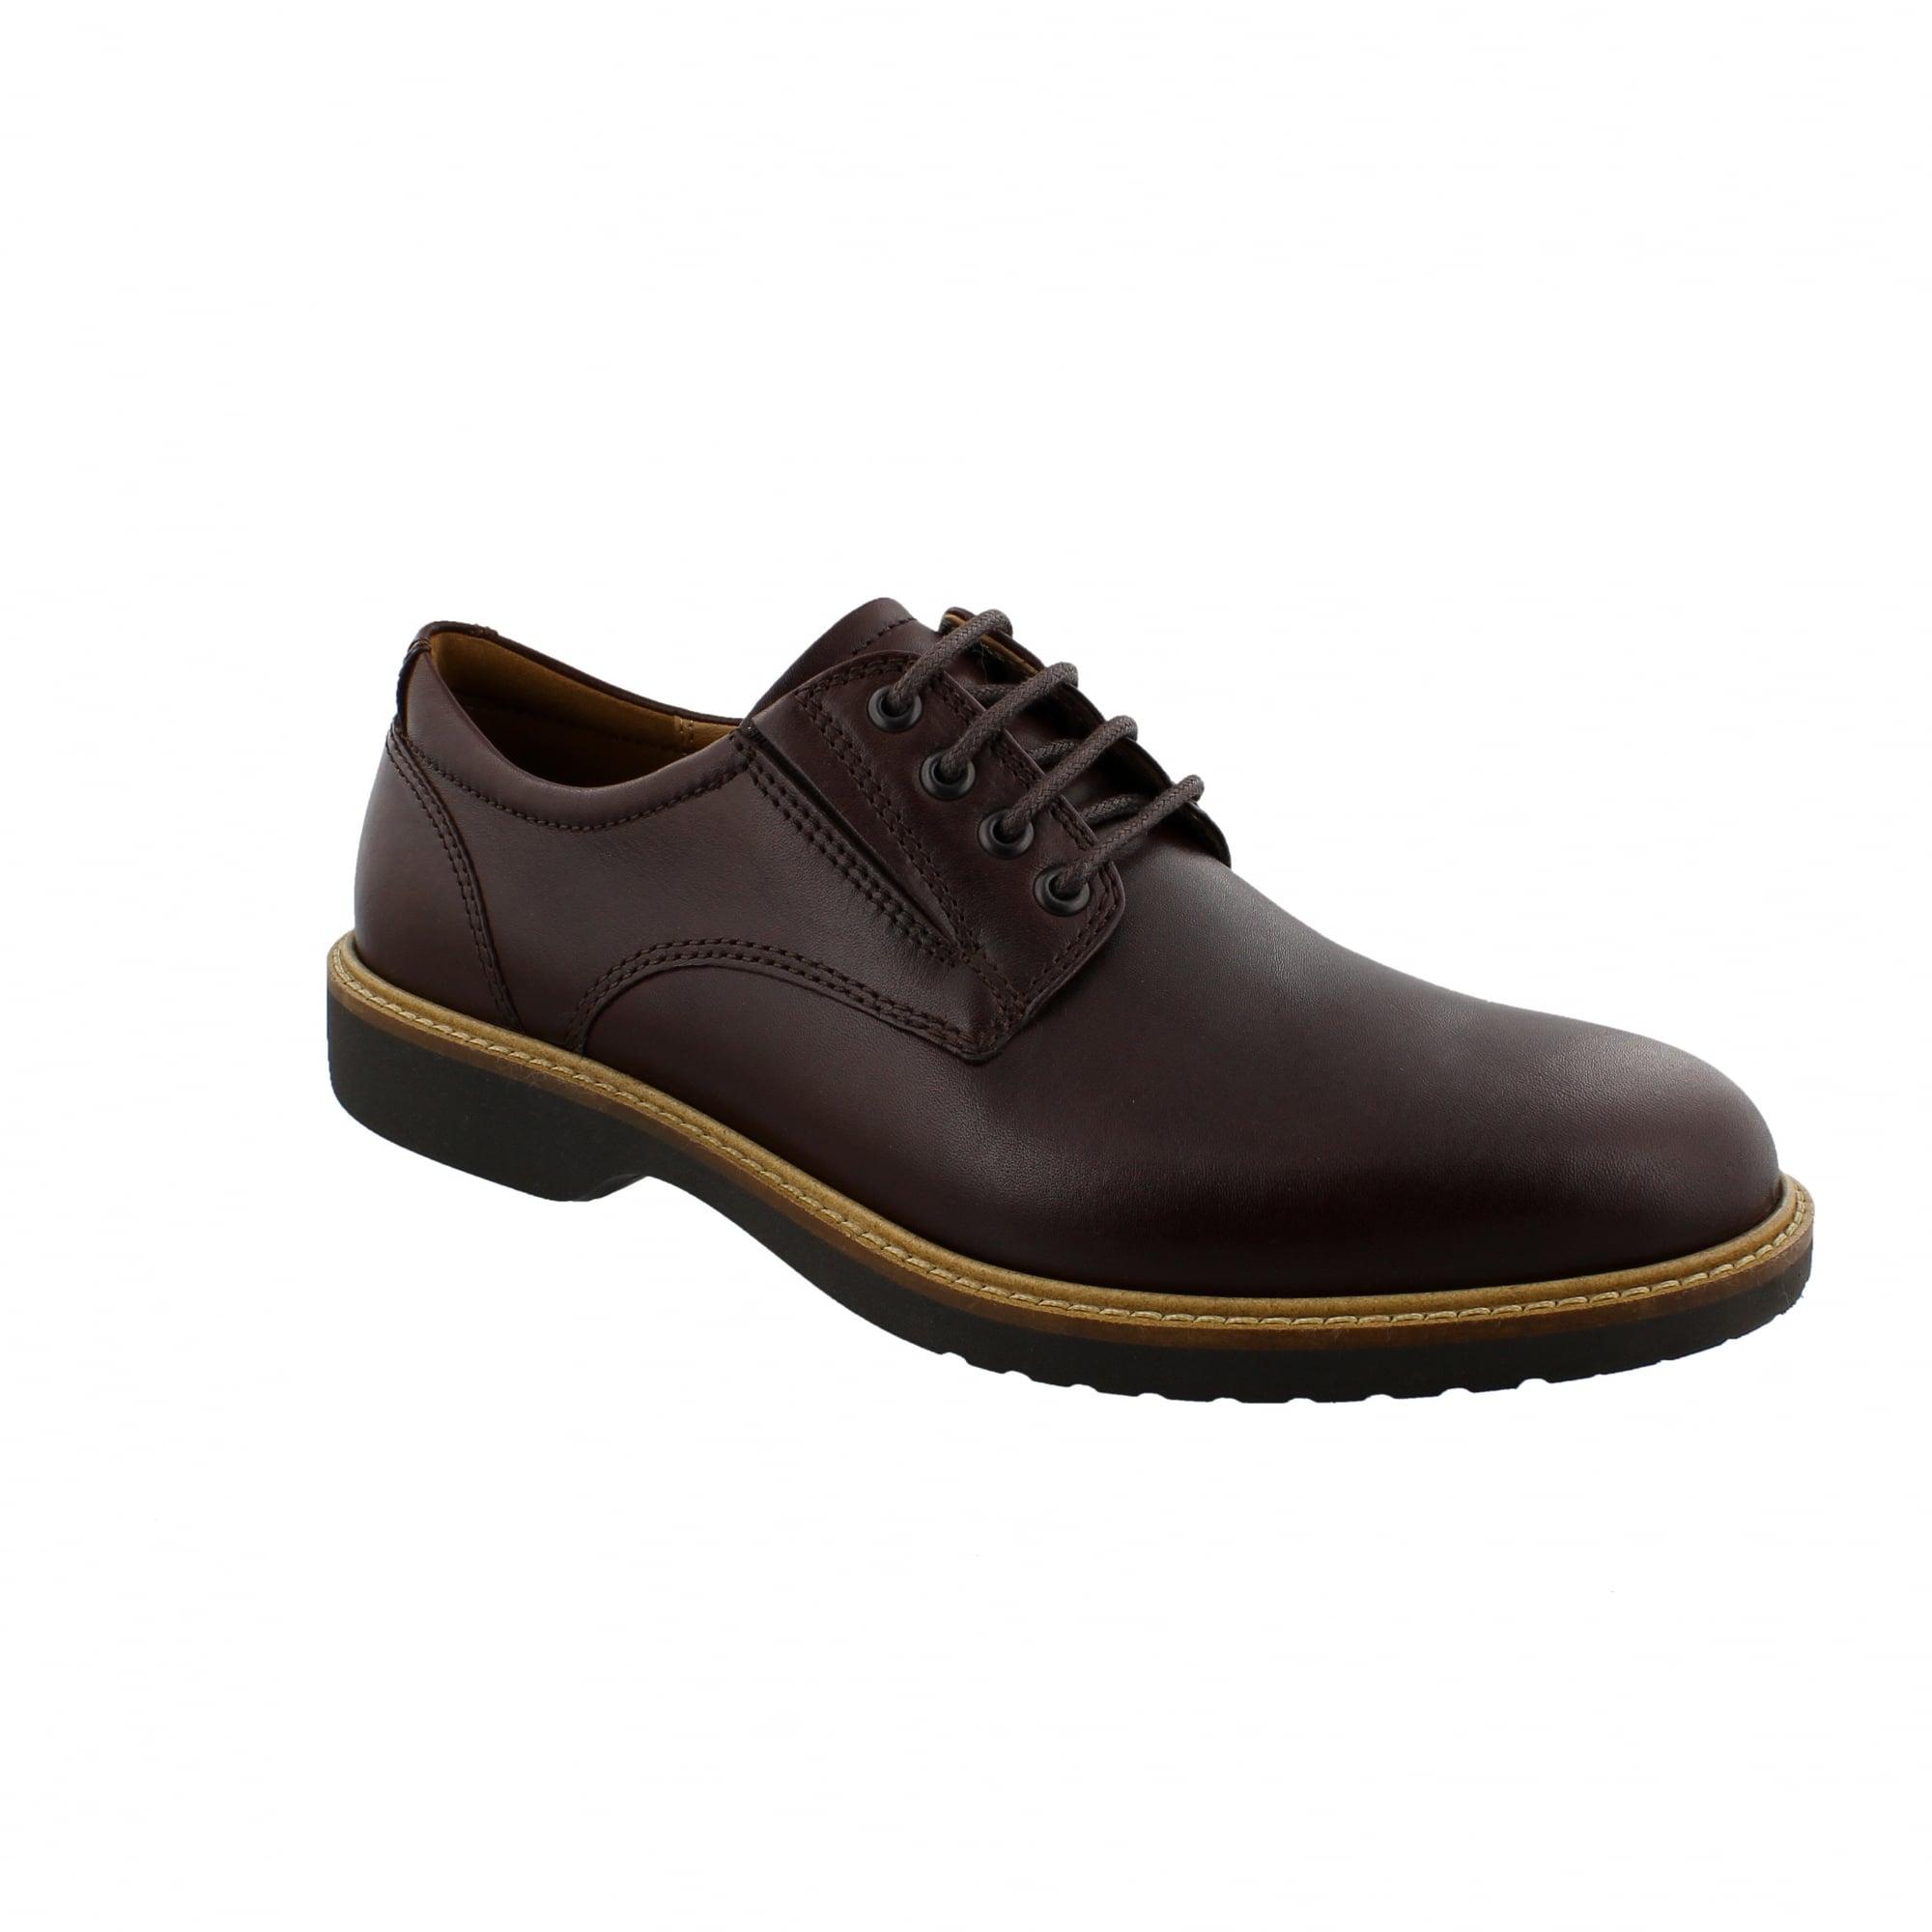 7a00e99ea Ecco Ian 533254-01014 Mens Shoes